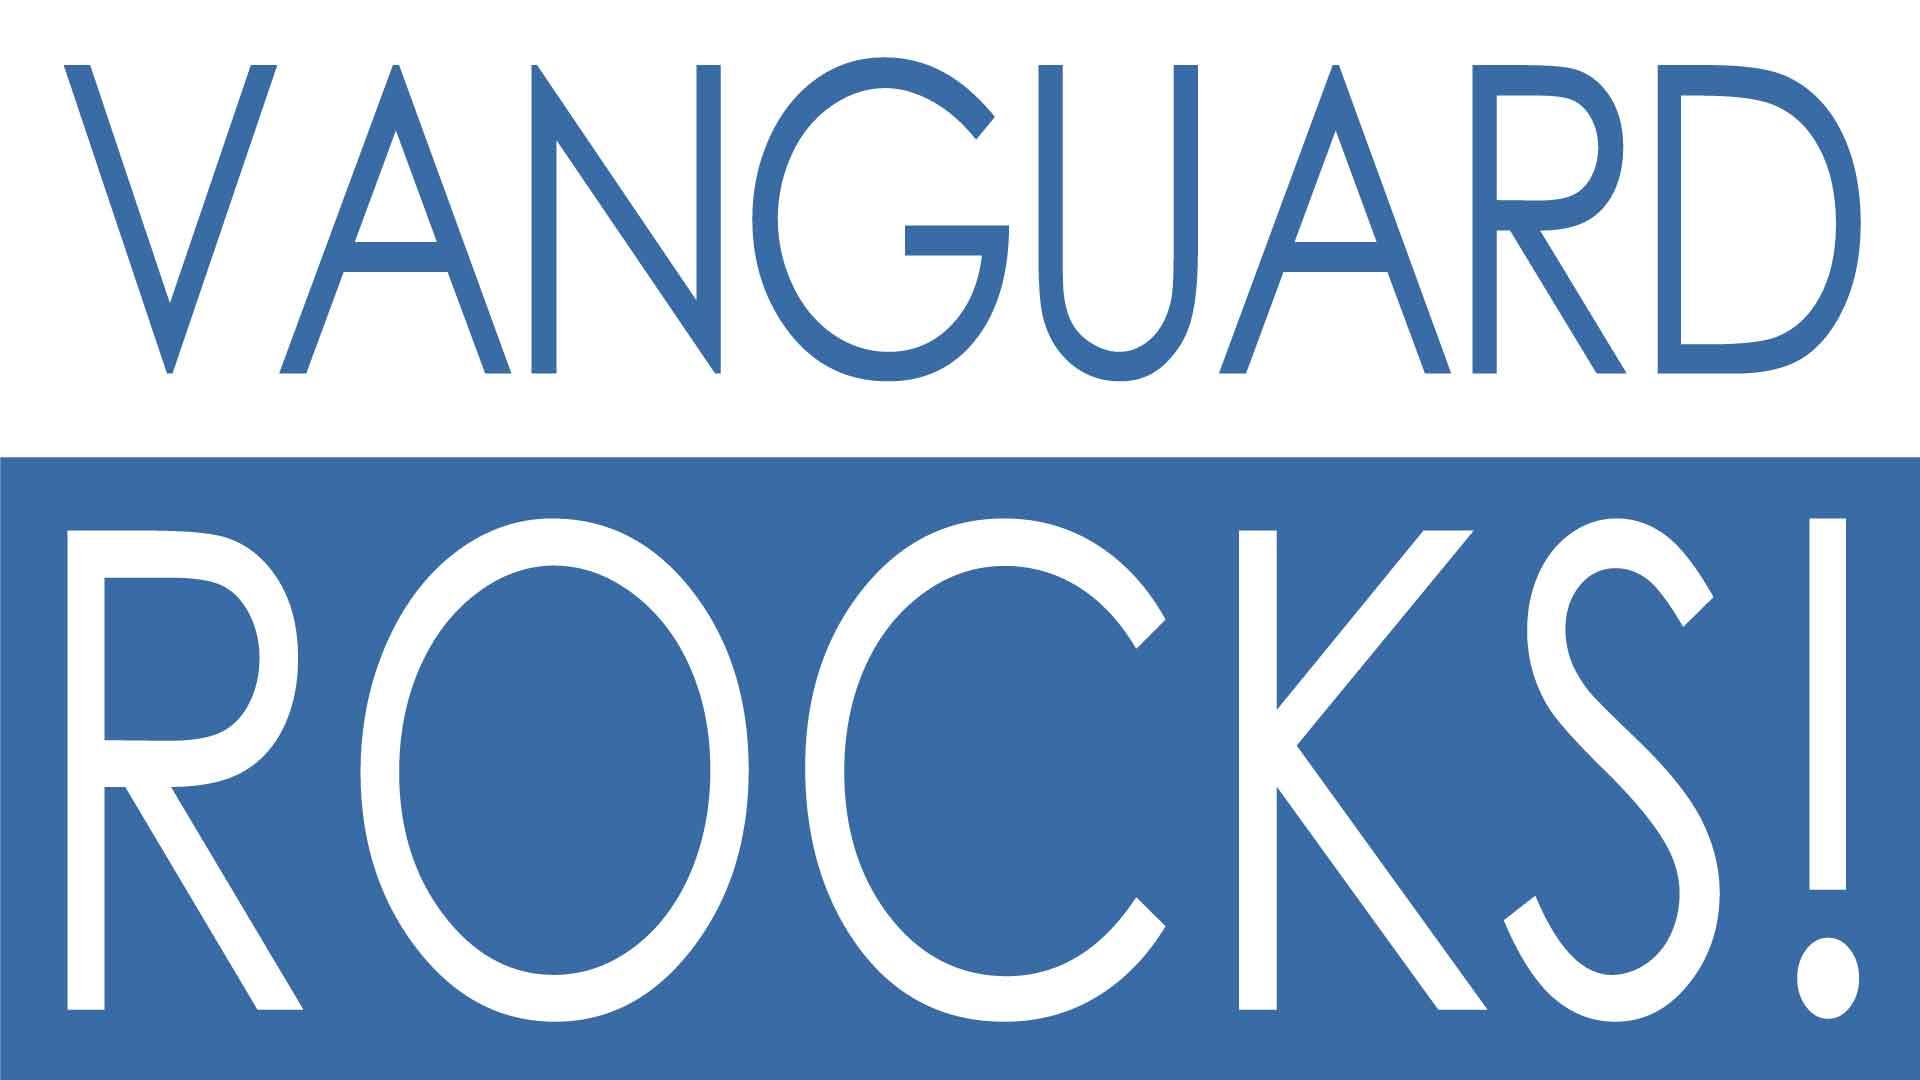 Vanguard Rocks: Simple Banner